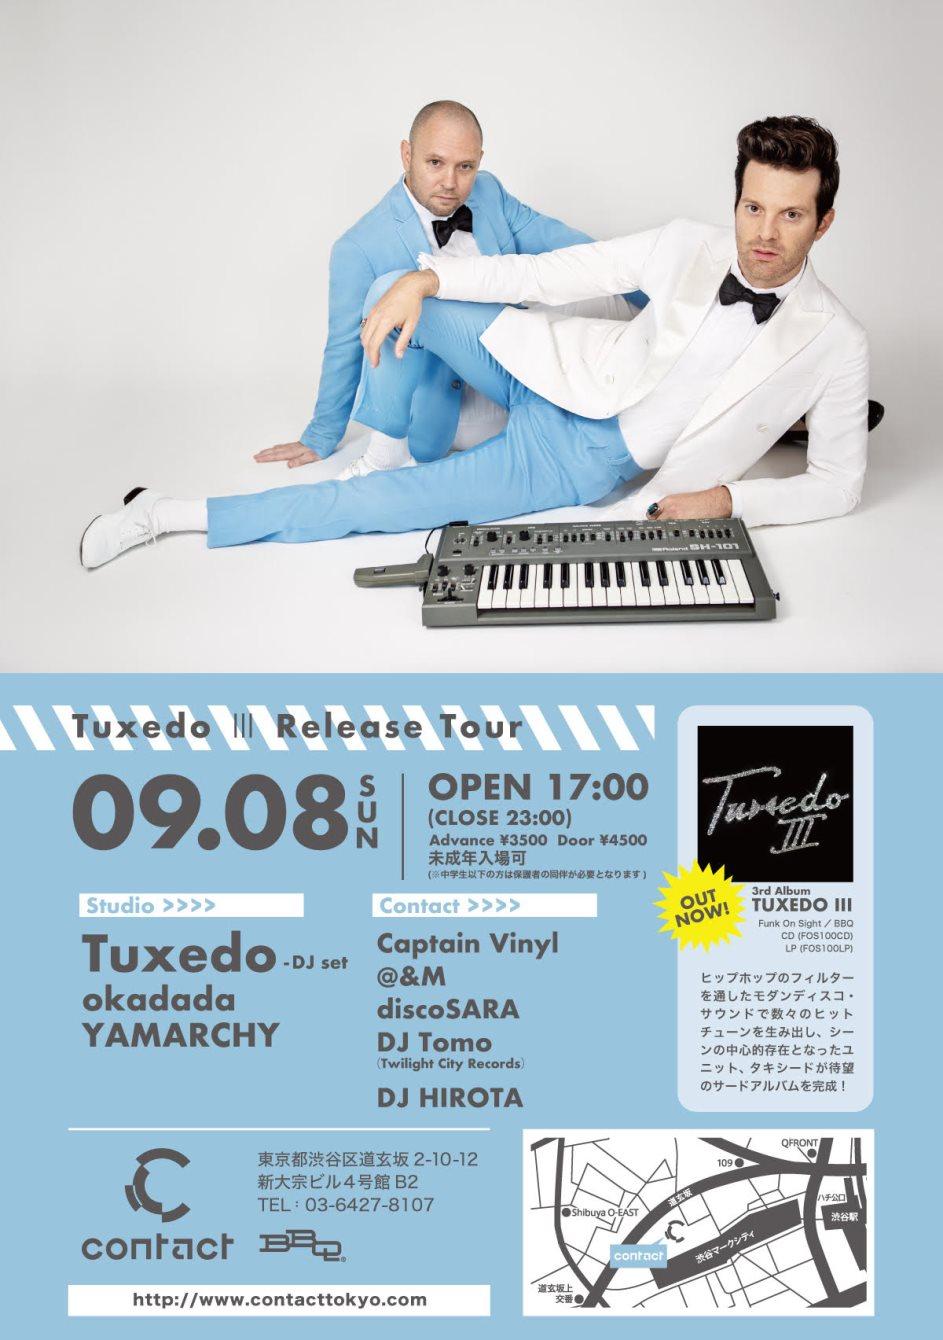 Tuxedo Ⅲ Release Tour - Flyer back